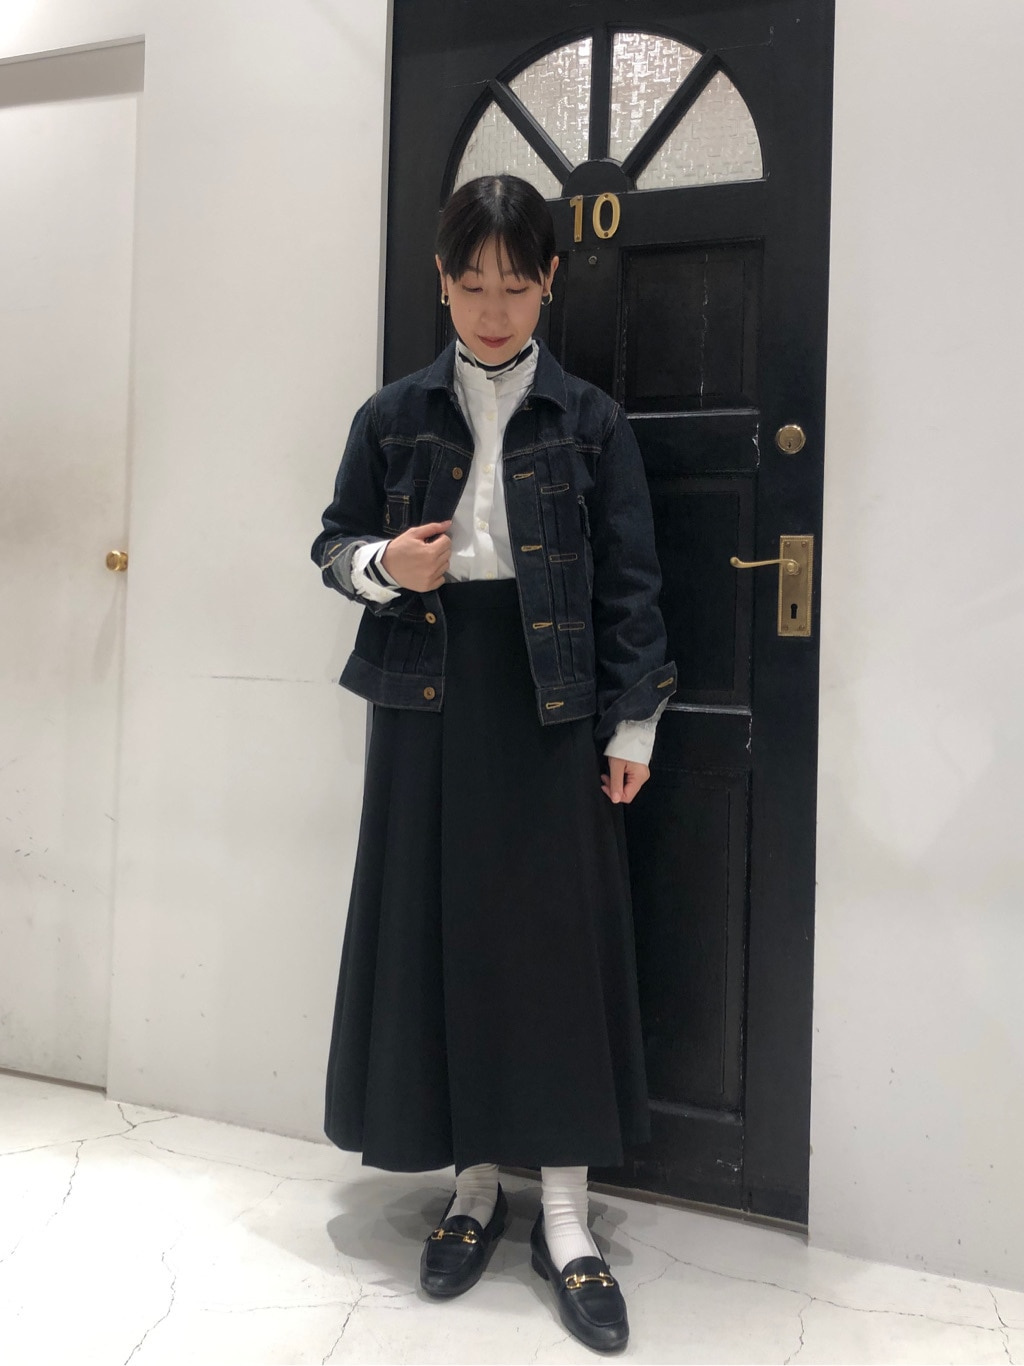 Dot and Stripes CHILD WOMAN ルクアイーレ 身長:151cm 2020.12.24